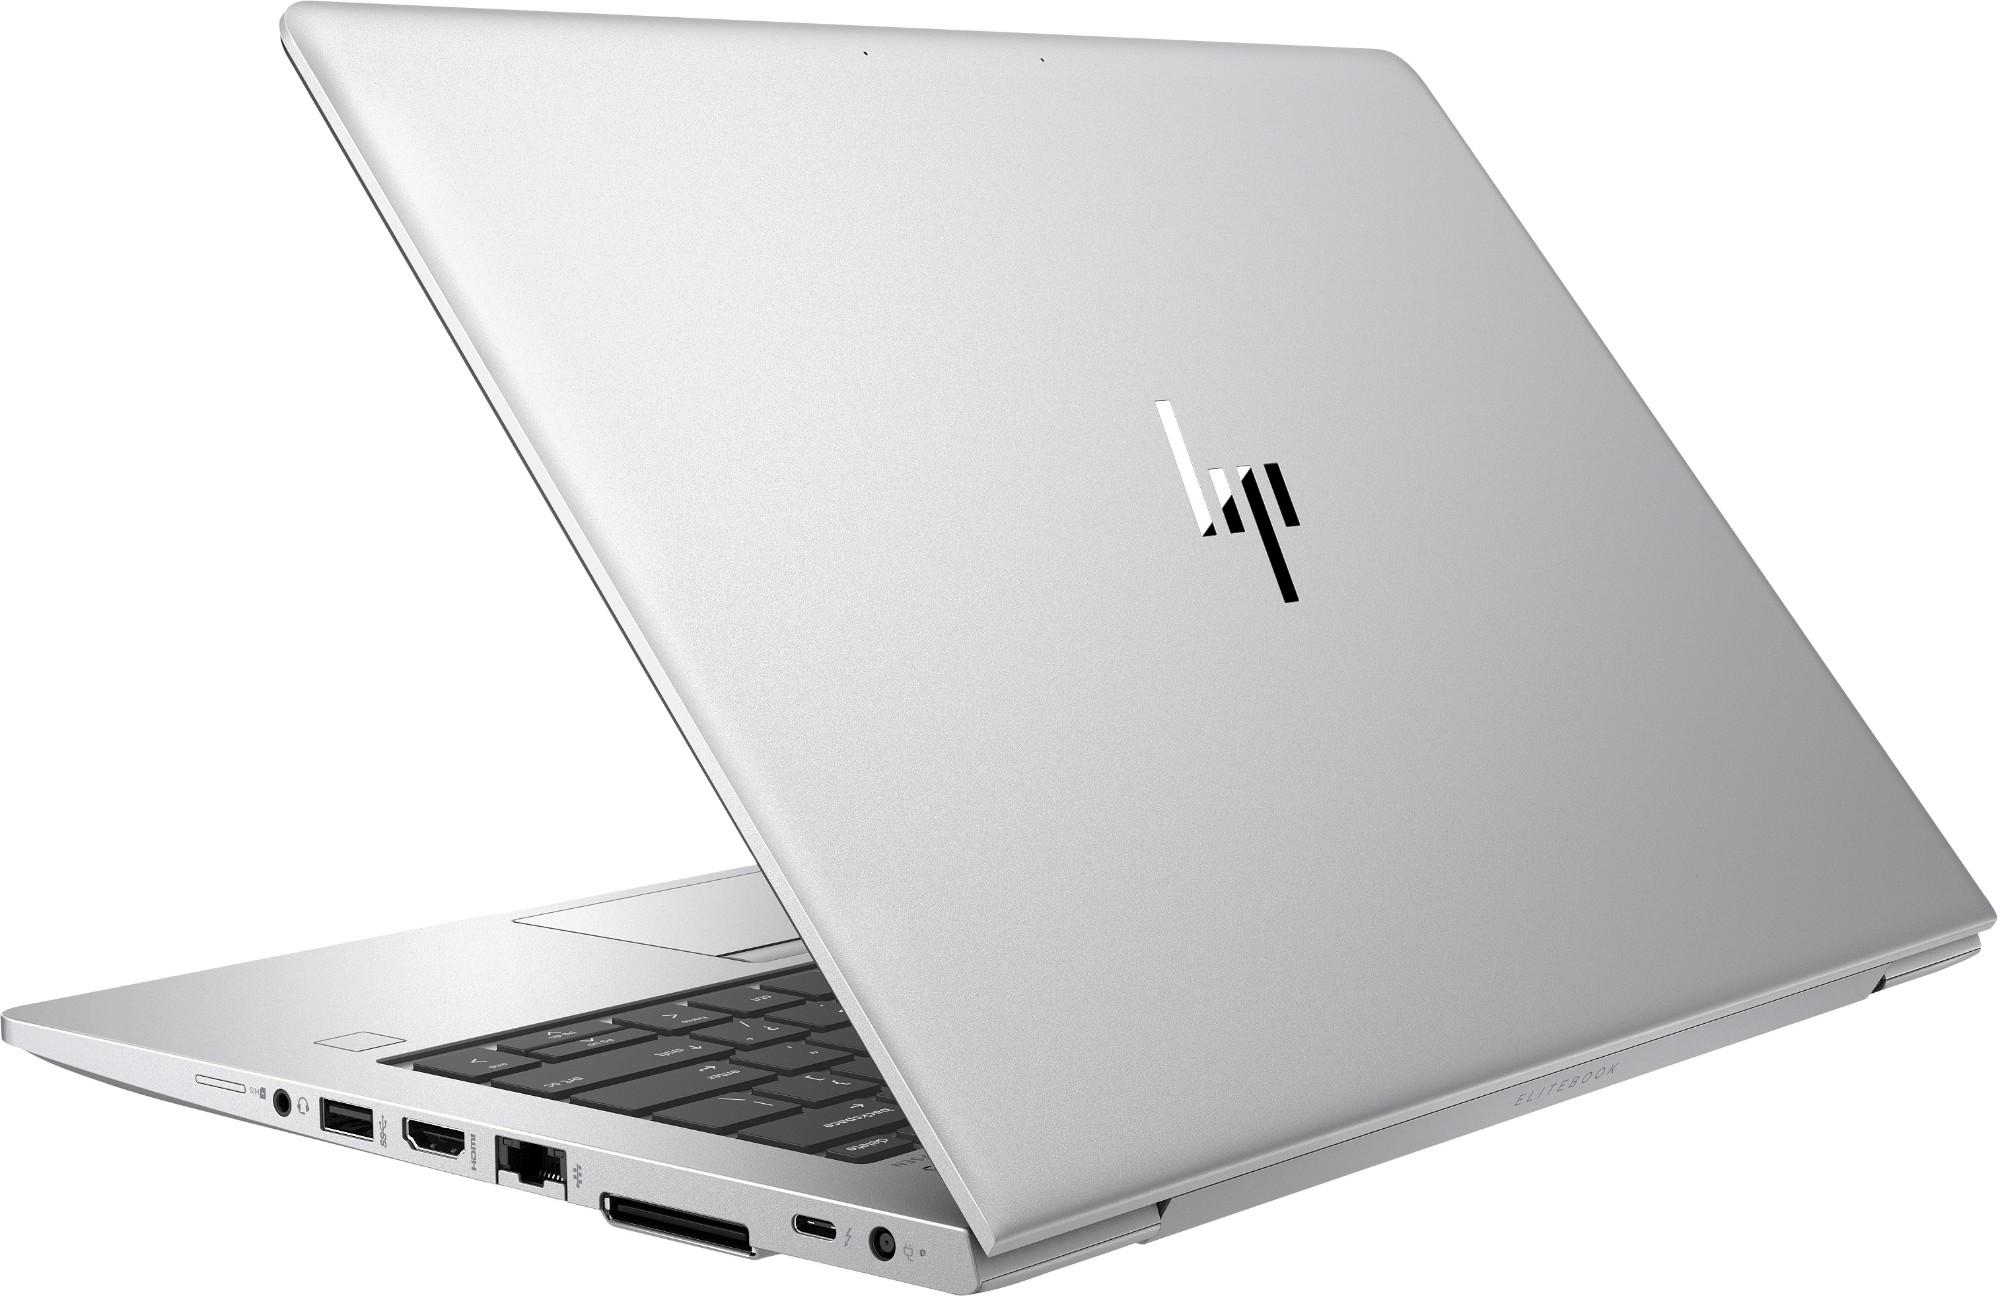 "HP EliteBook 830 G5 Silver Notebook 33.8 cm (13.3"") 1920 x 1080 pixels 8th gen Intel® Core™ i5 8 GB DDR4-SDRAM 256 GB SSD Windows 10 Pro"